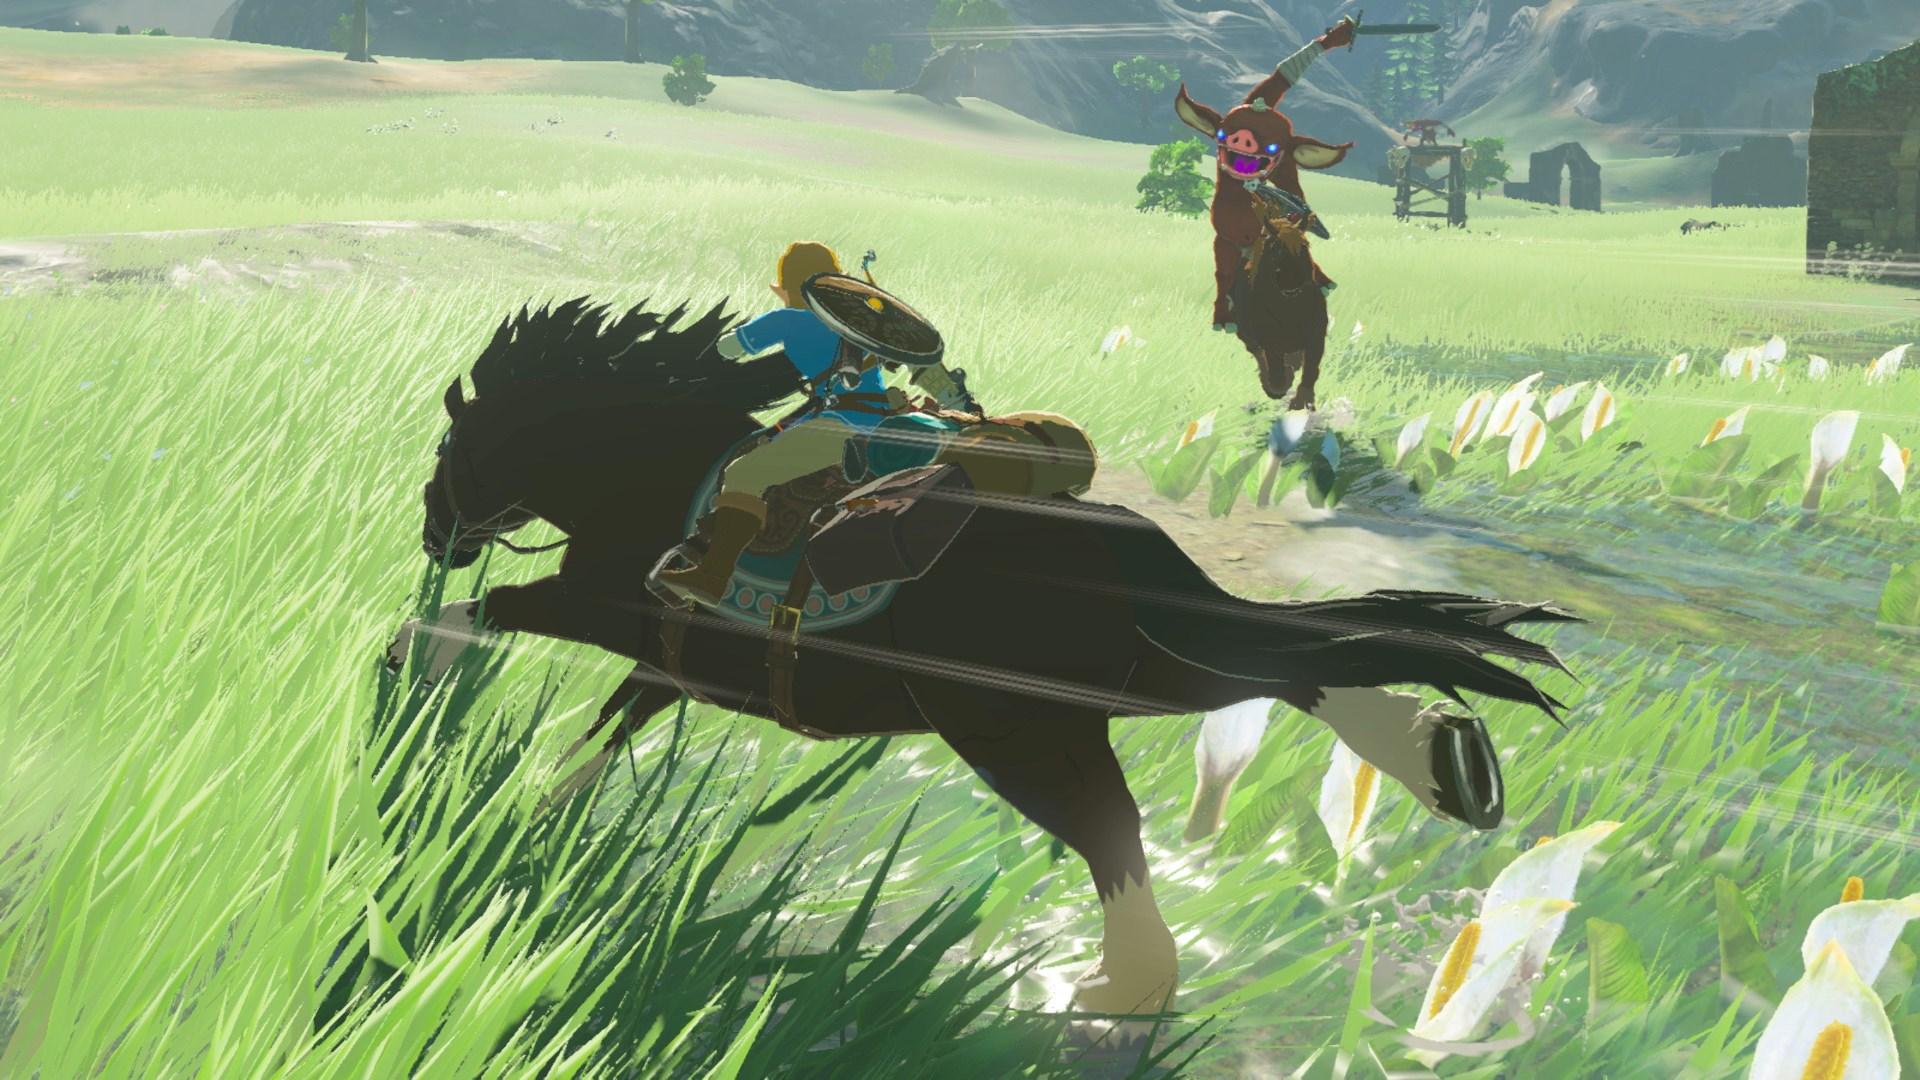 The Account of Zelda: Breath of the Wild